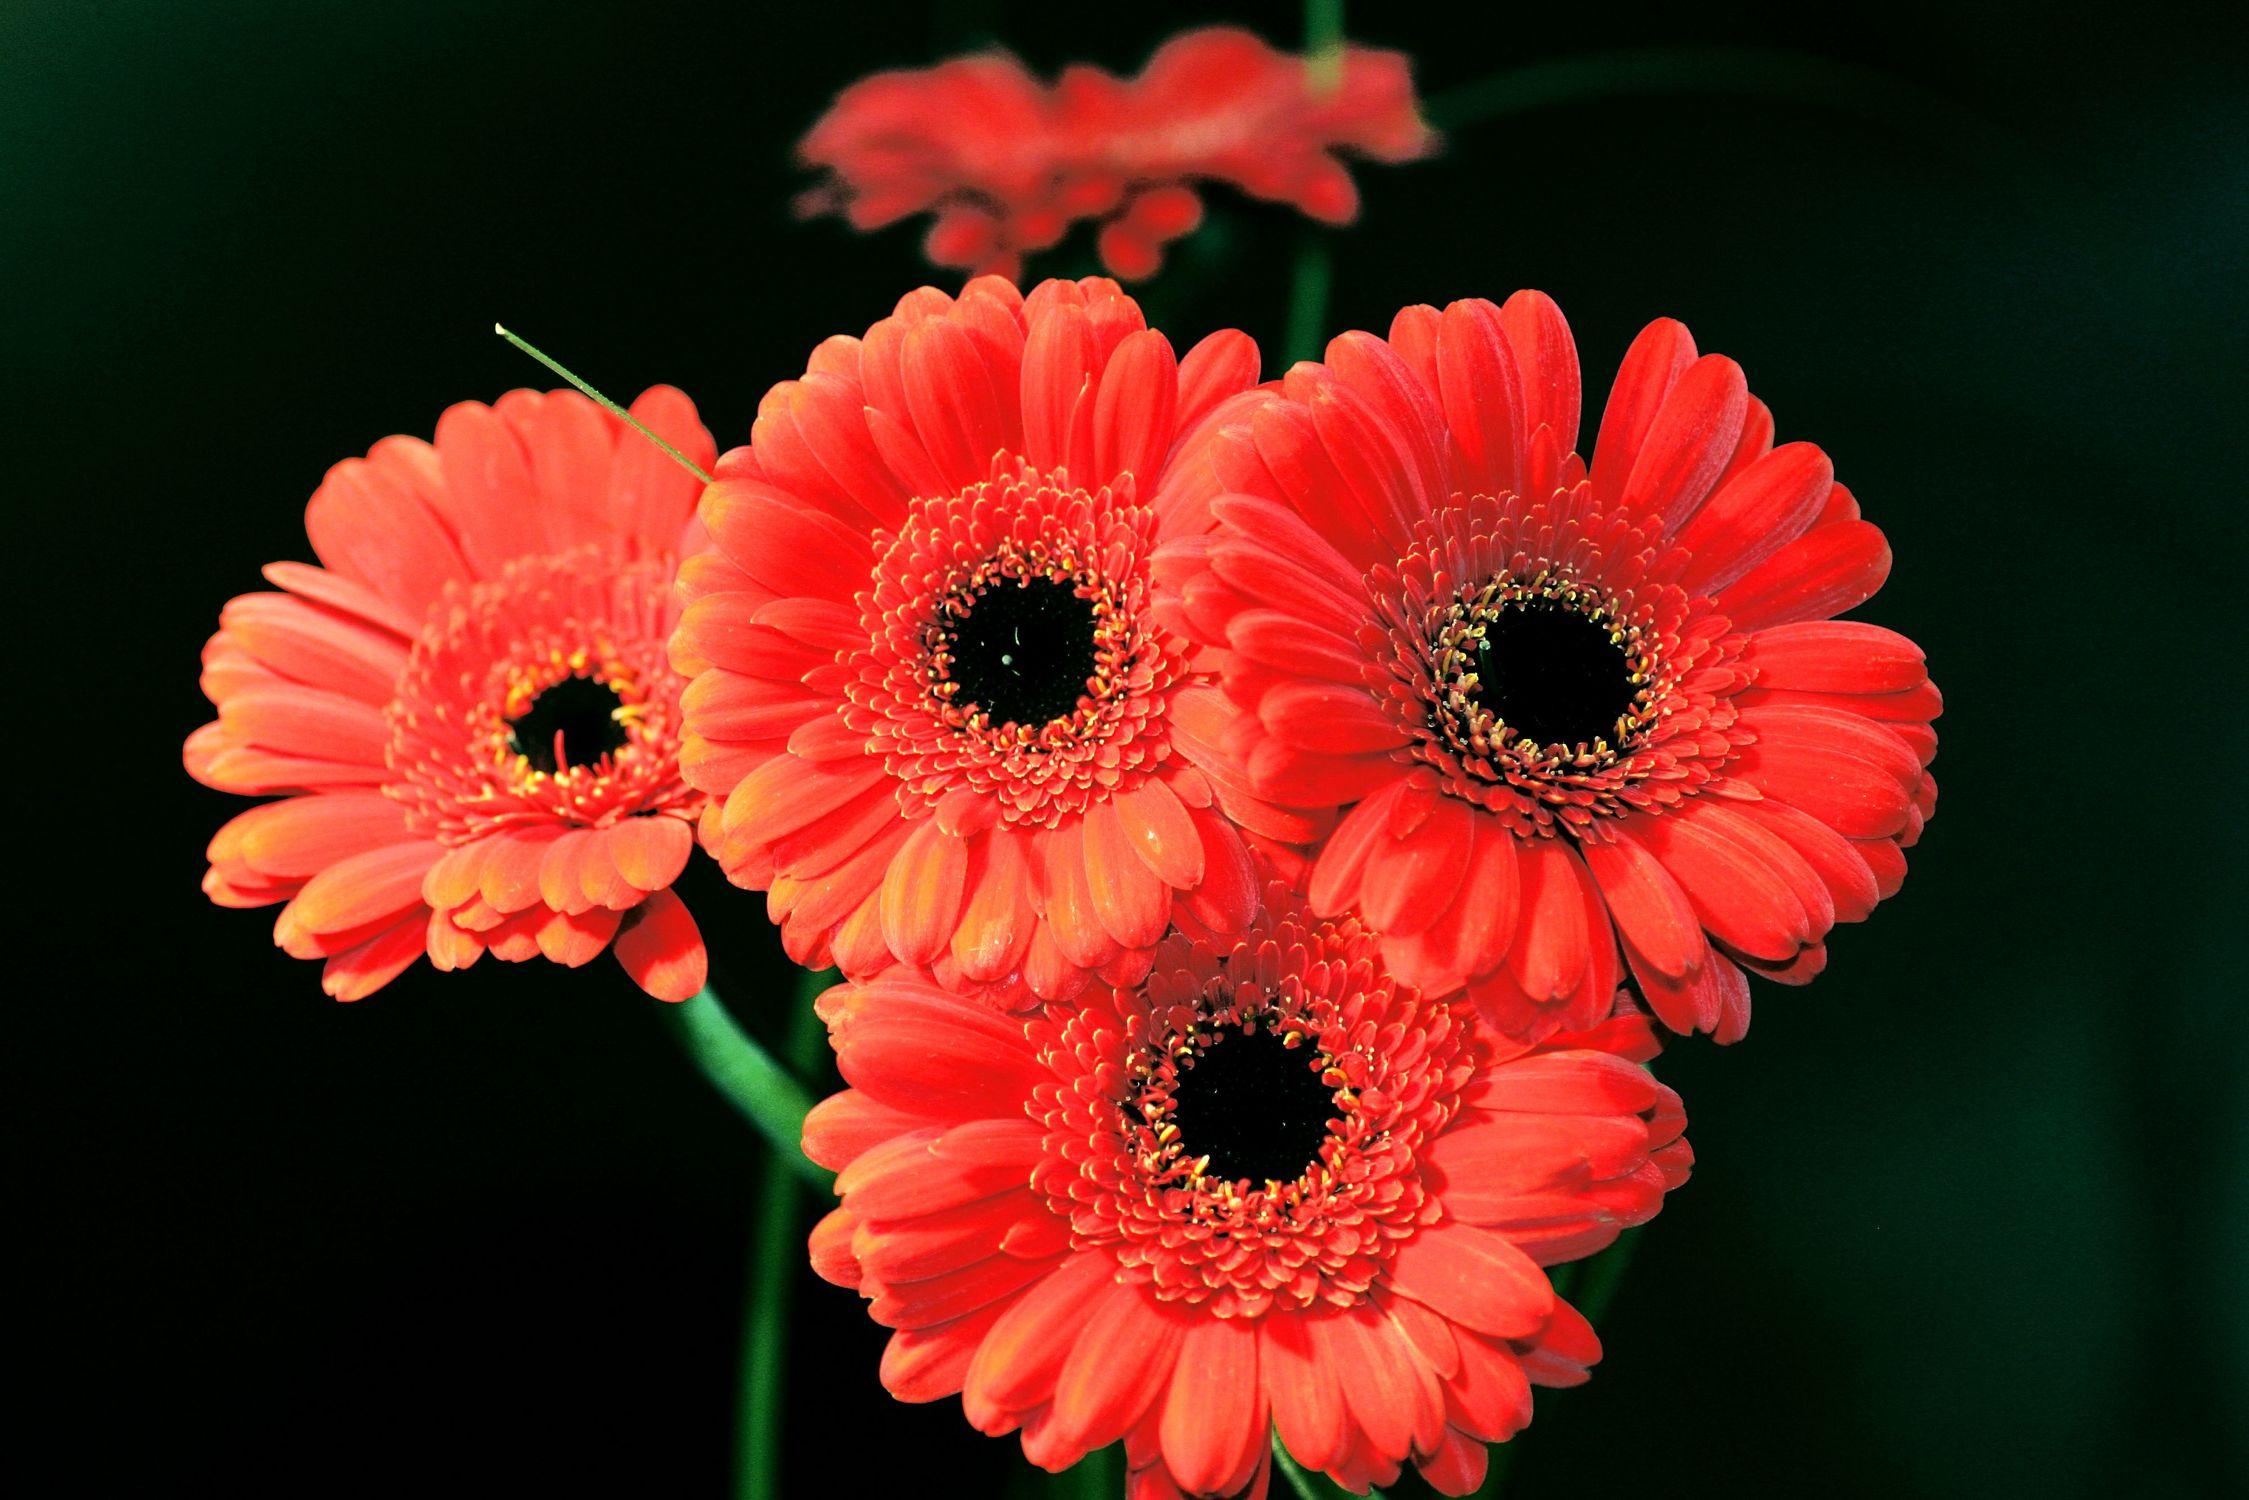 Bild mit Natur, Pflanzen, Blumen, Korbblütler, Gerberas, Blume, Pflanze, Flower, Flowers, Blumenstrauß, Gerbera, Schnittblume, rote Gerbera, rote Gerberas